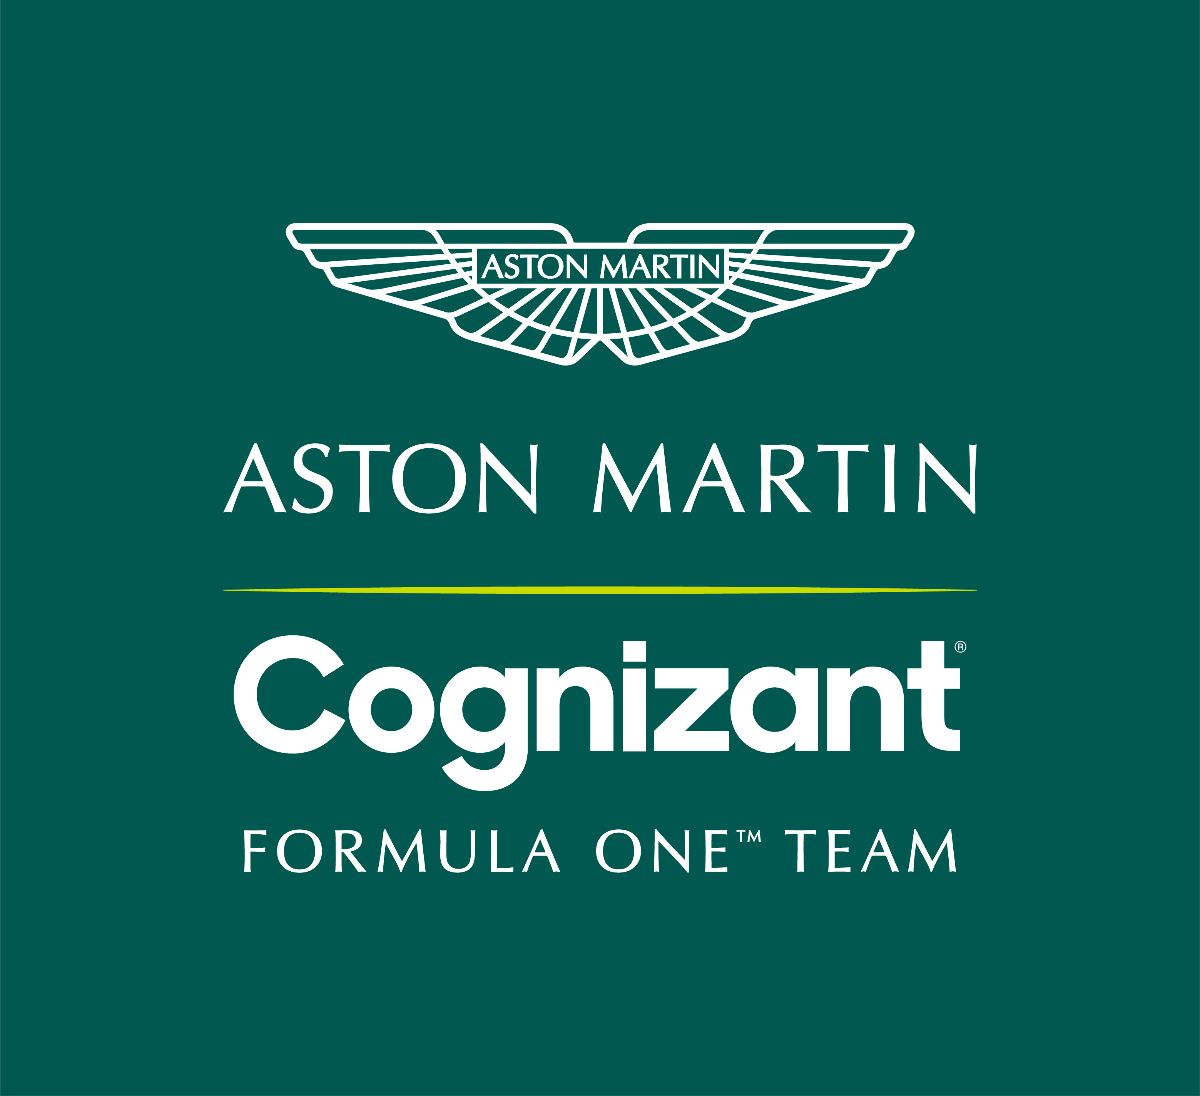 Cognizant title partner Aston Martin F1